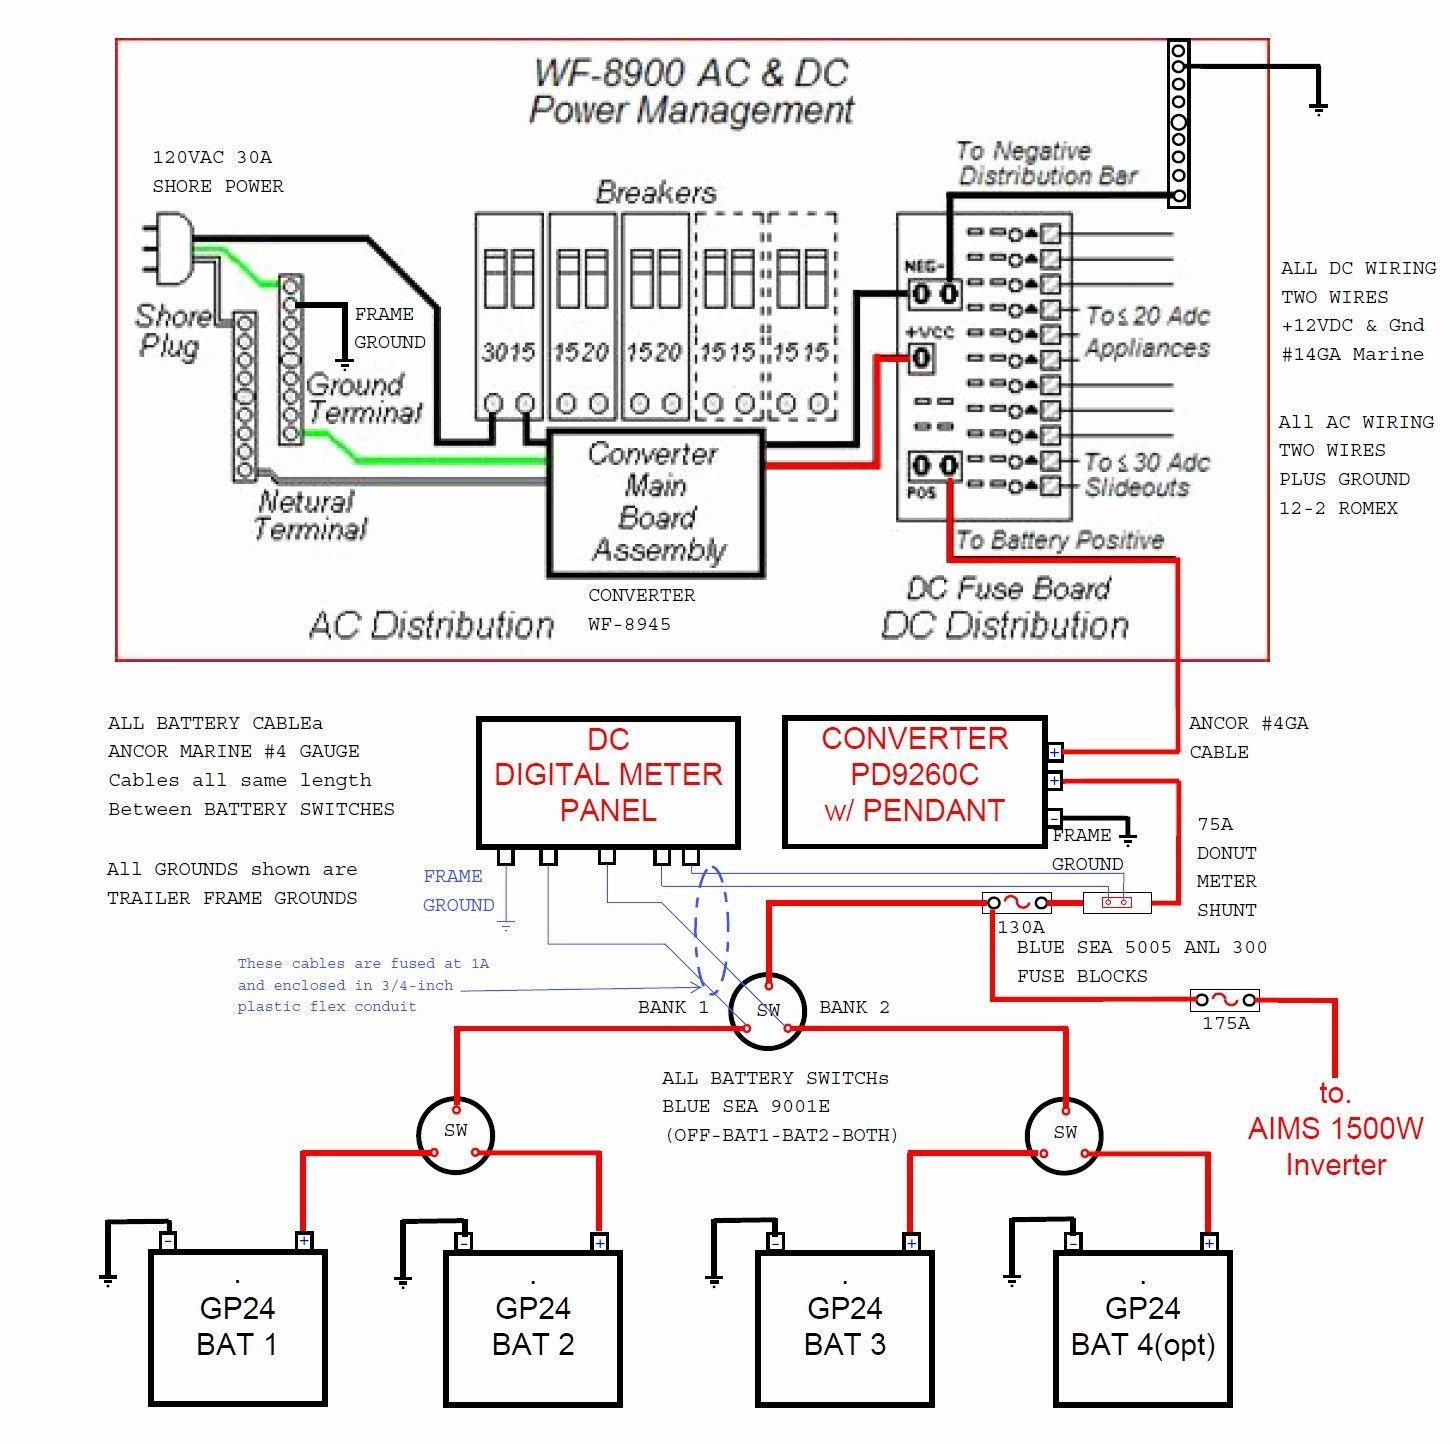 30 Amp Rv Plug Wiring Diagram Inspirational Wiring Diagram For Rv - 30 Amp Plug Wiring Diagram